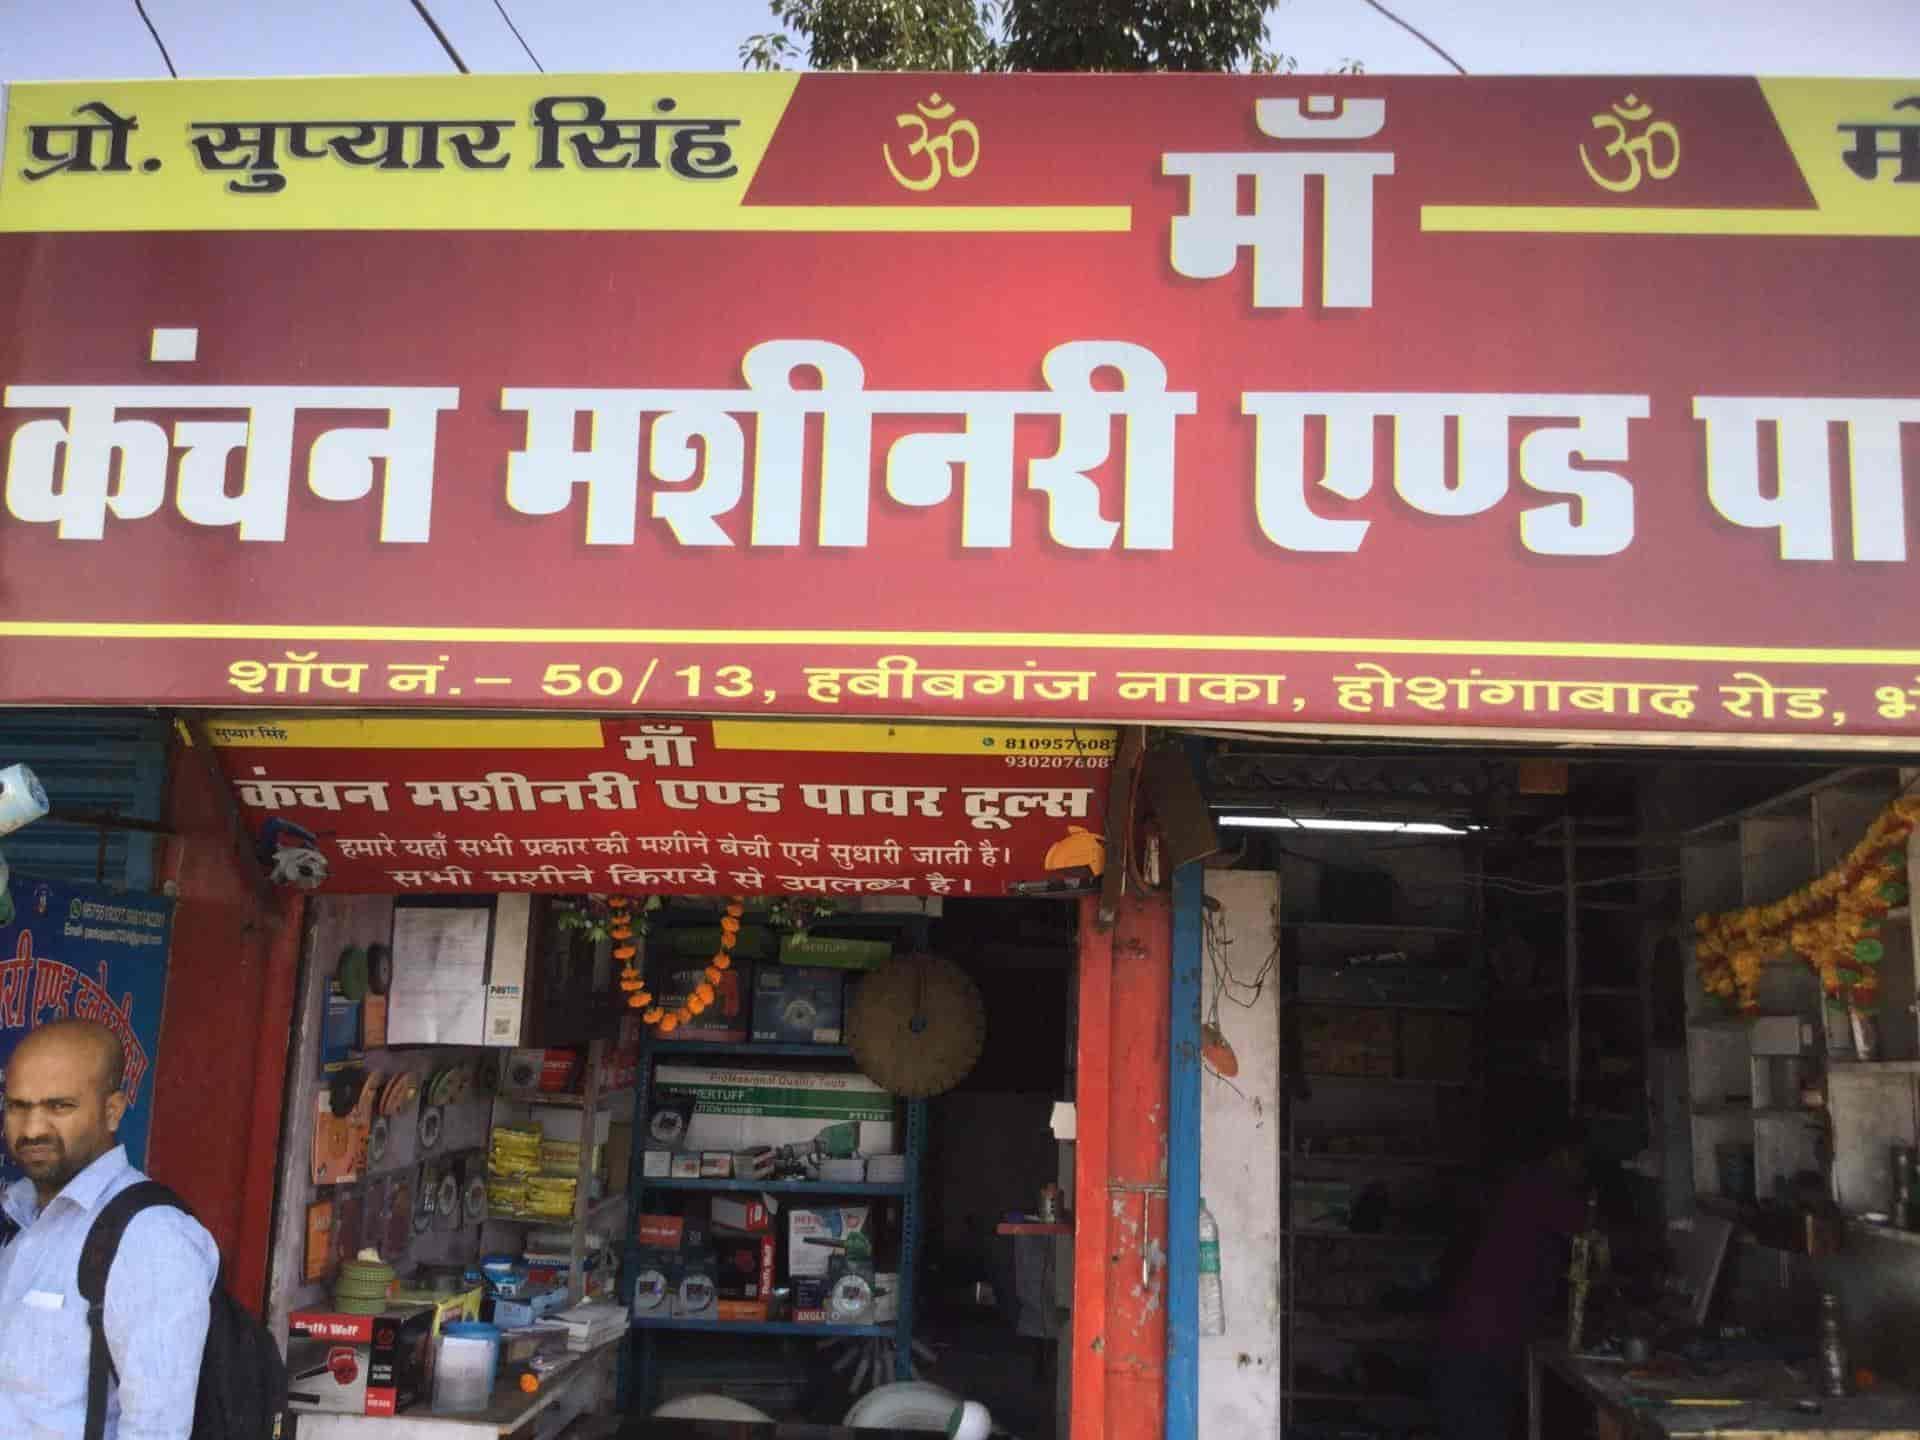 Maa Kanchan Machinari And Power Tools, Habibganj - Drilling